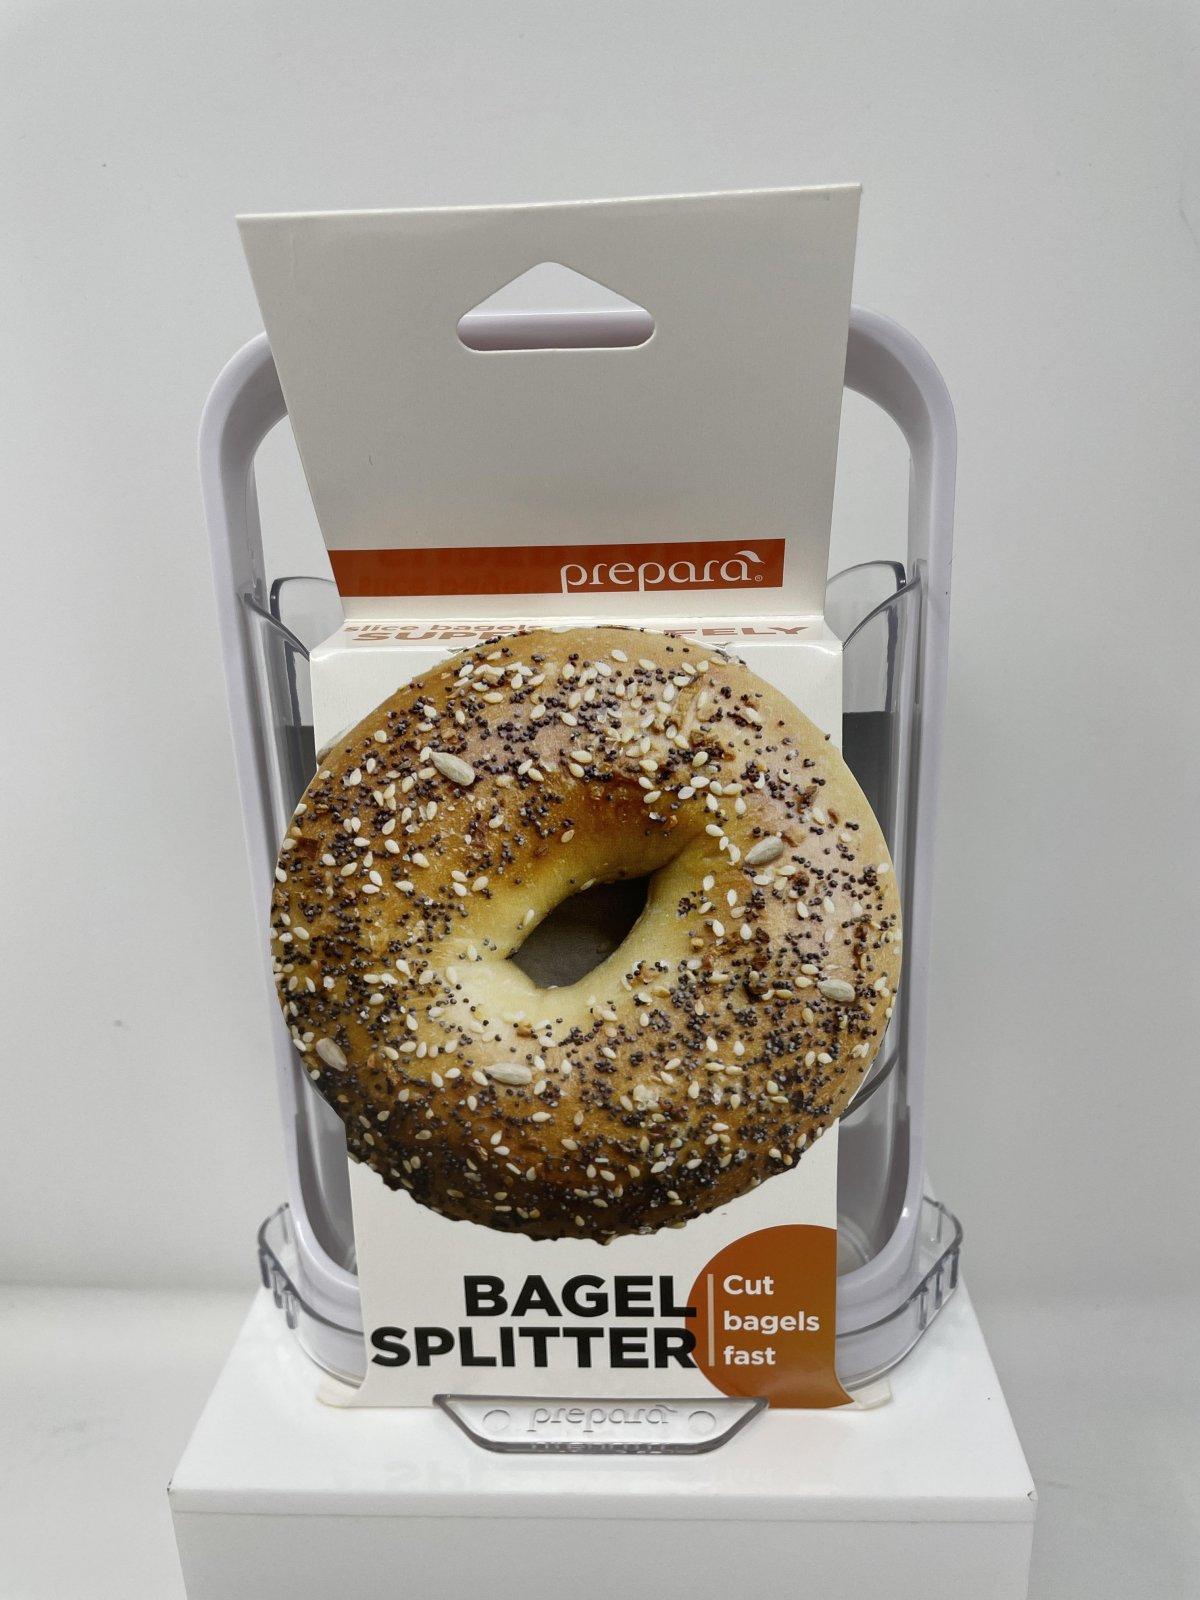 Bagel Splitter